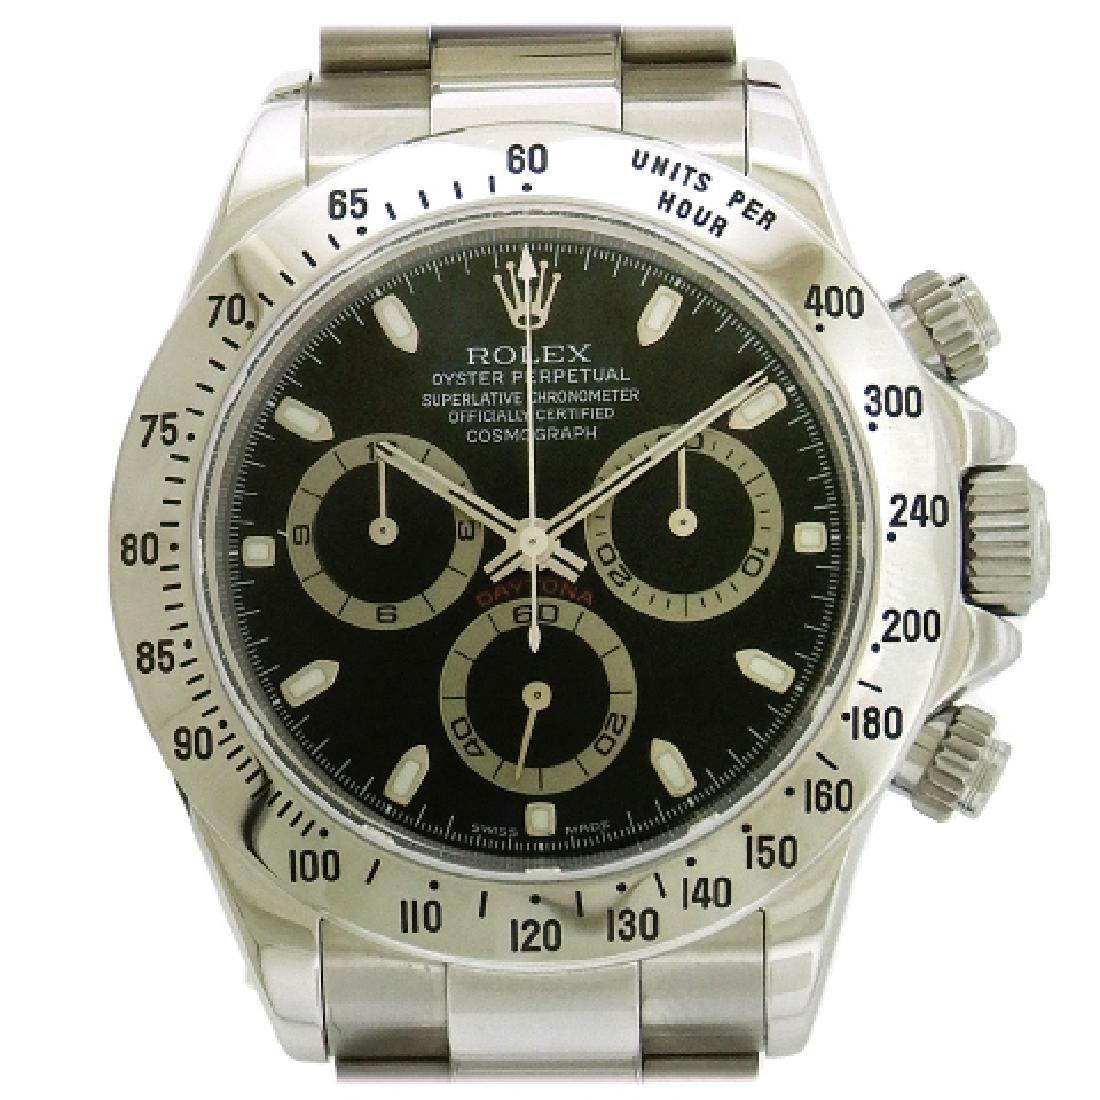 Rolex Daytona Stainless Steel Cosmograph Watch